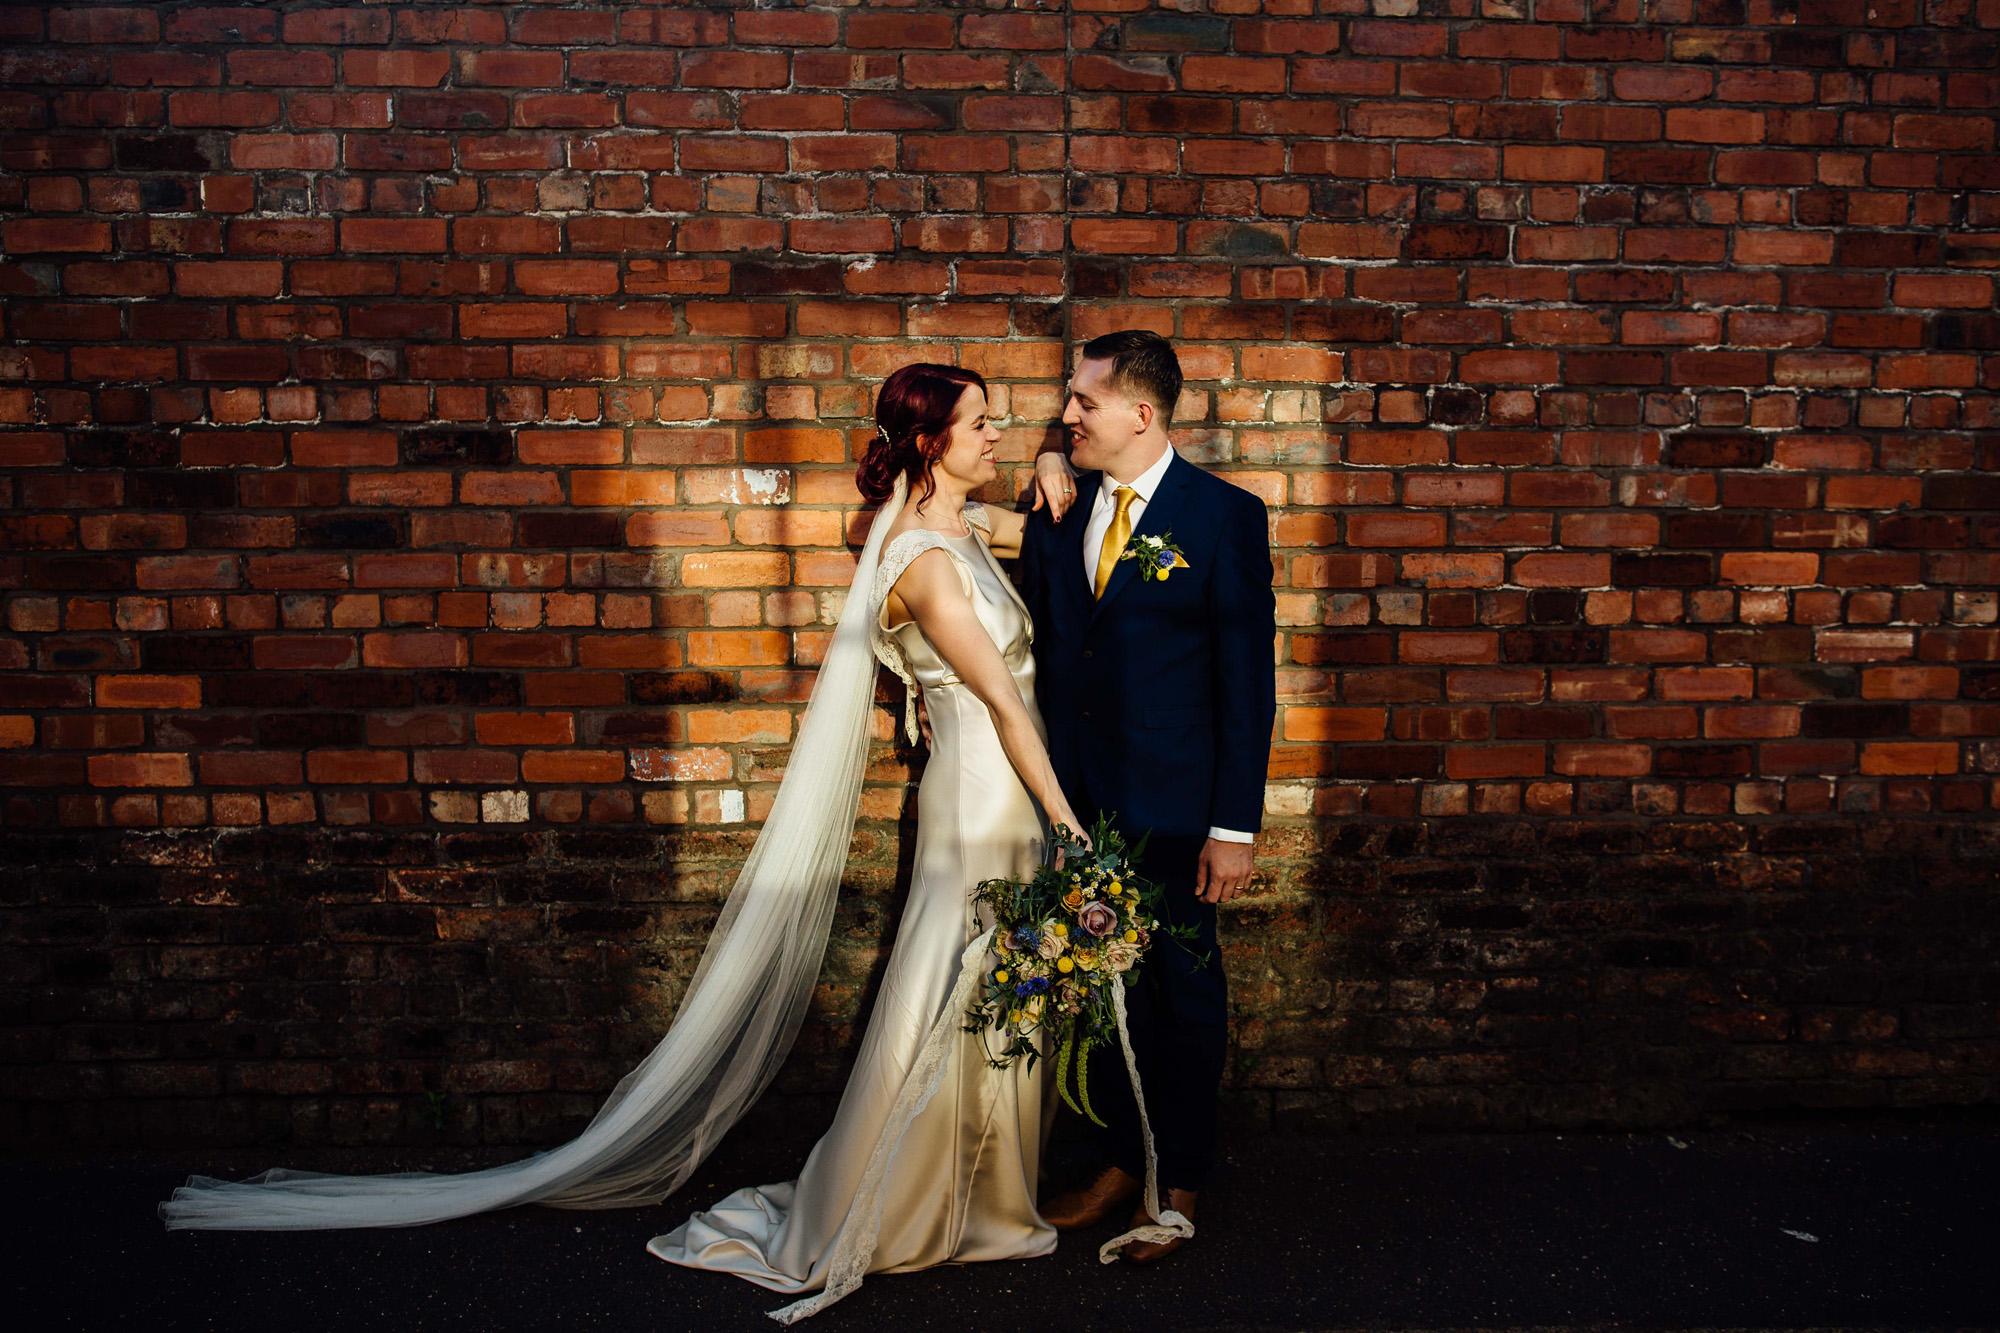 Sarah-Honeysuckle-Bias-Cut-Silk-Vintage-Inspired-Wedding-Gown-Sheffield-Wedding-Kate-Beaumont-56.jpg